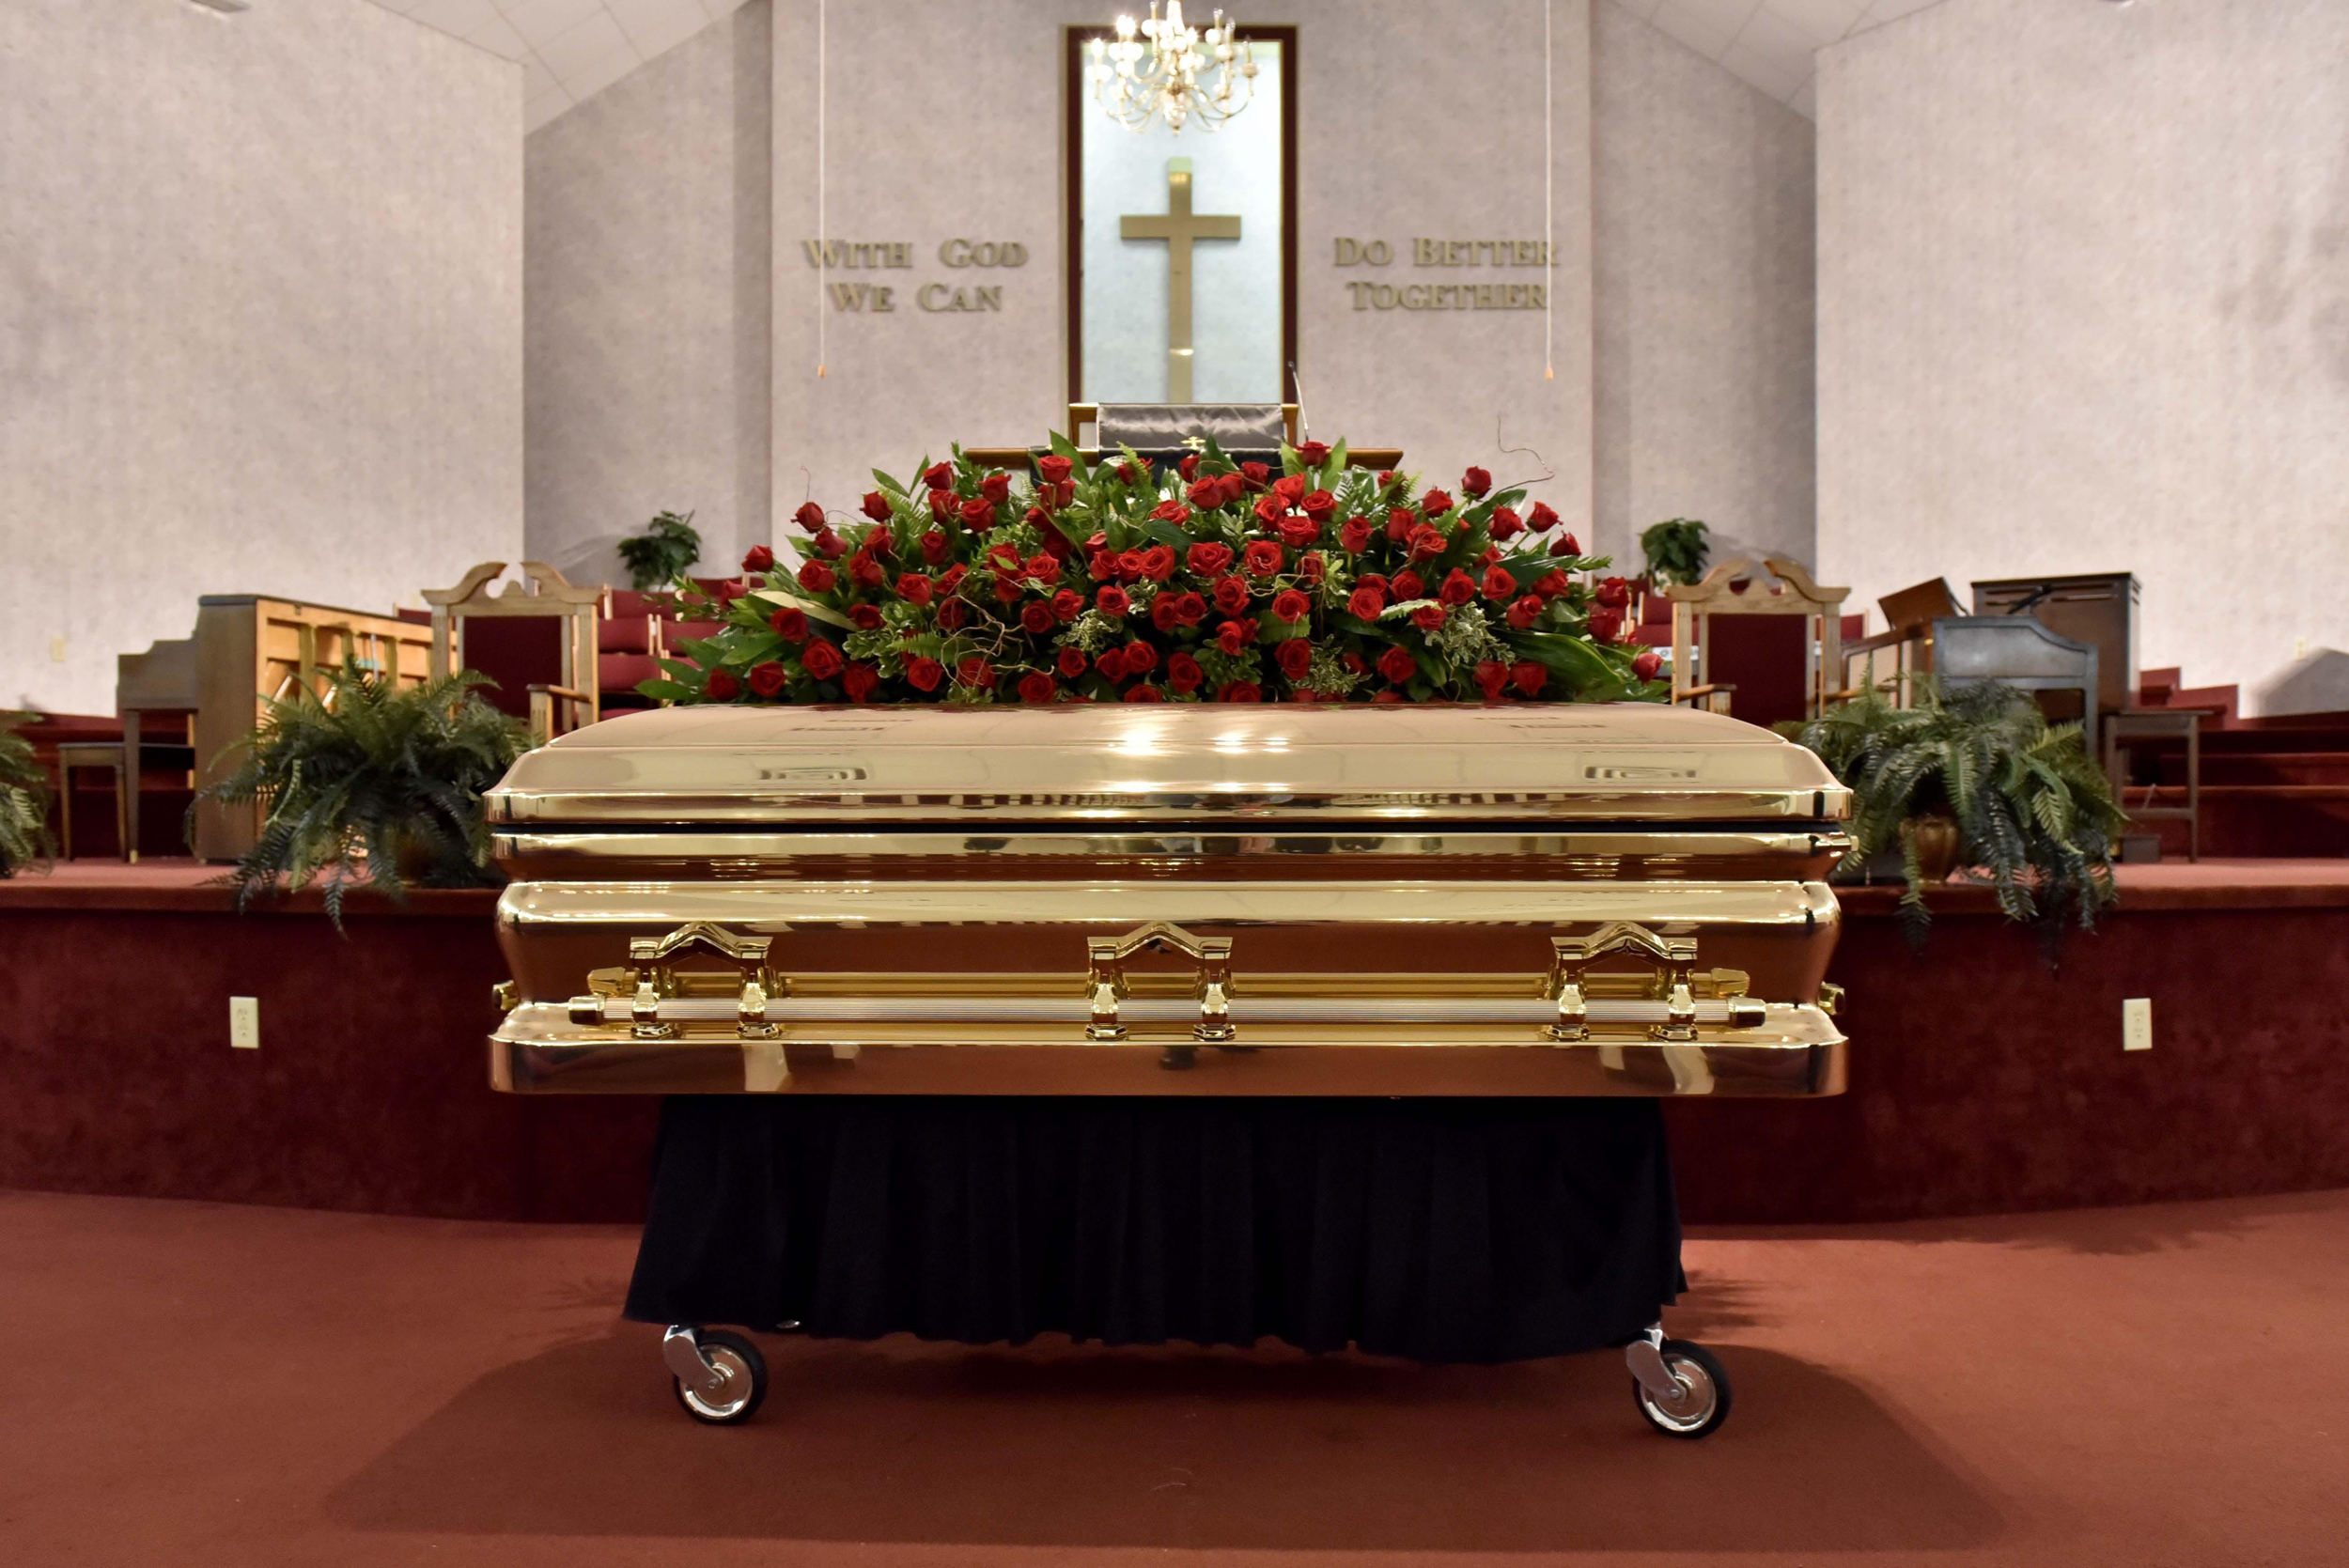 Don T Let George Floyd S Death Be In Vain Speakers Say At N Carolina Memorial Service